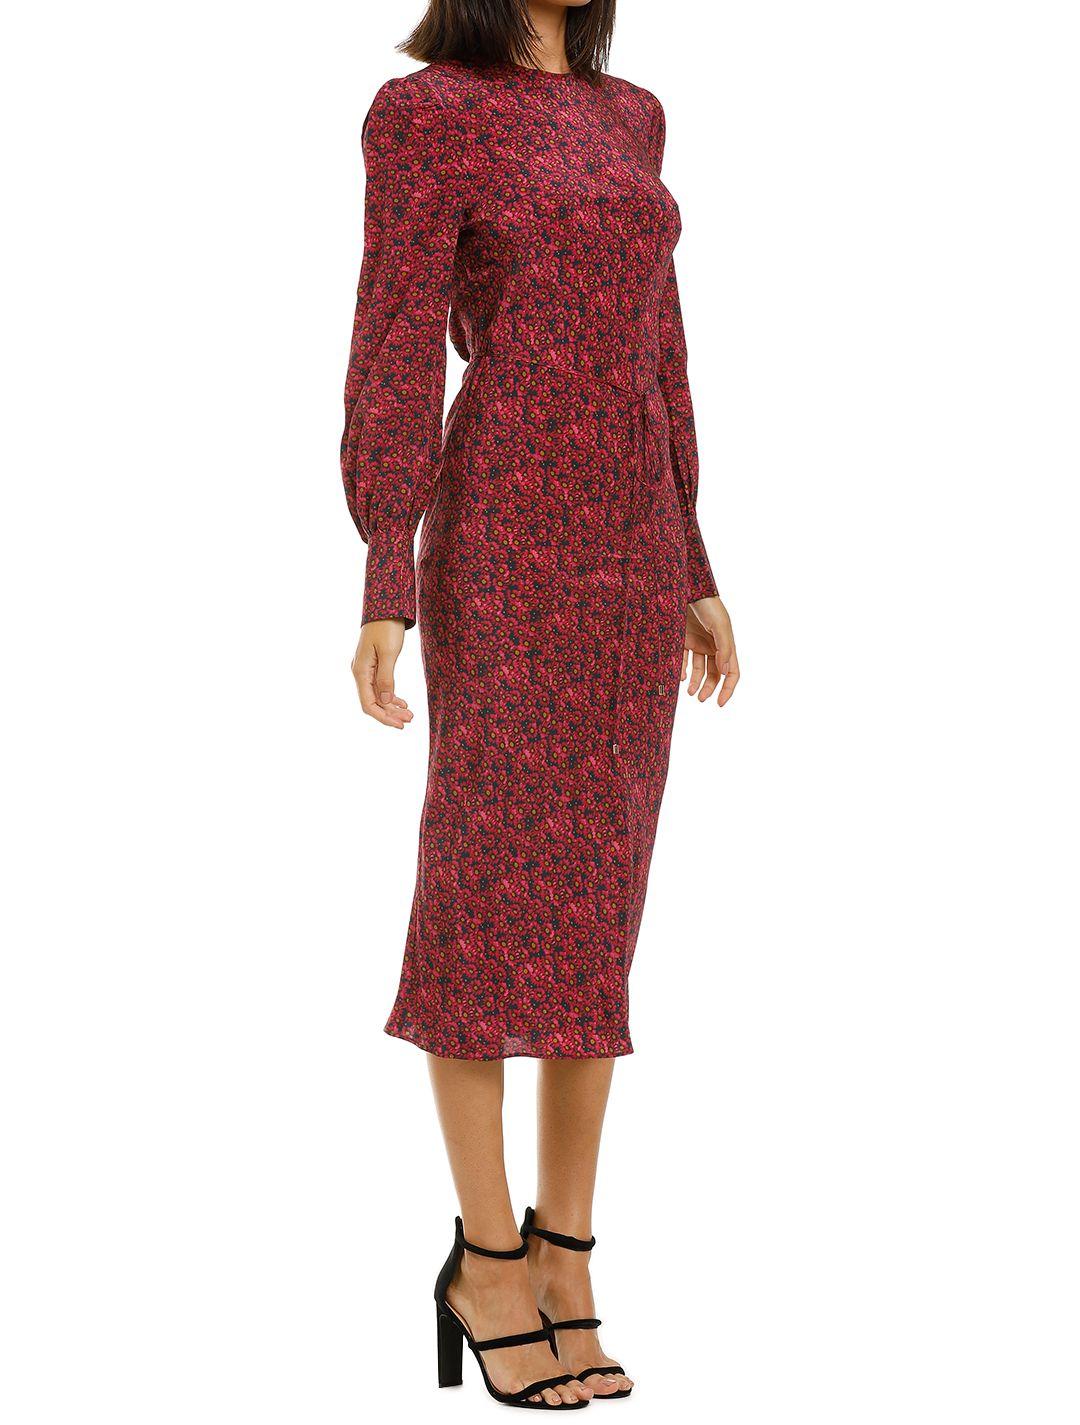 Rebecca-Vallance-Rosetter-LS-Midi-Dress-Berry-Floral-Side